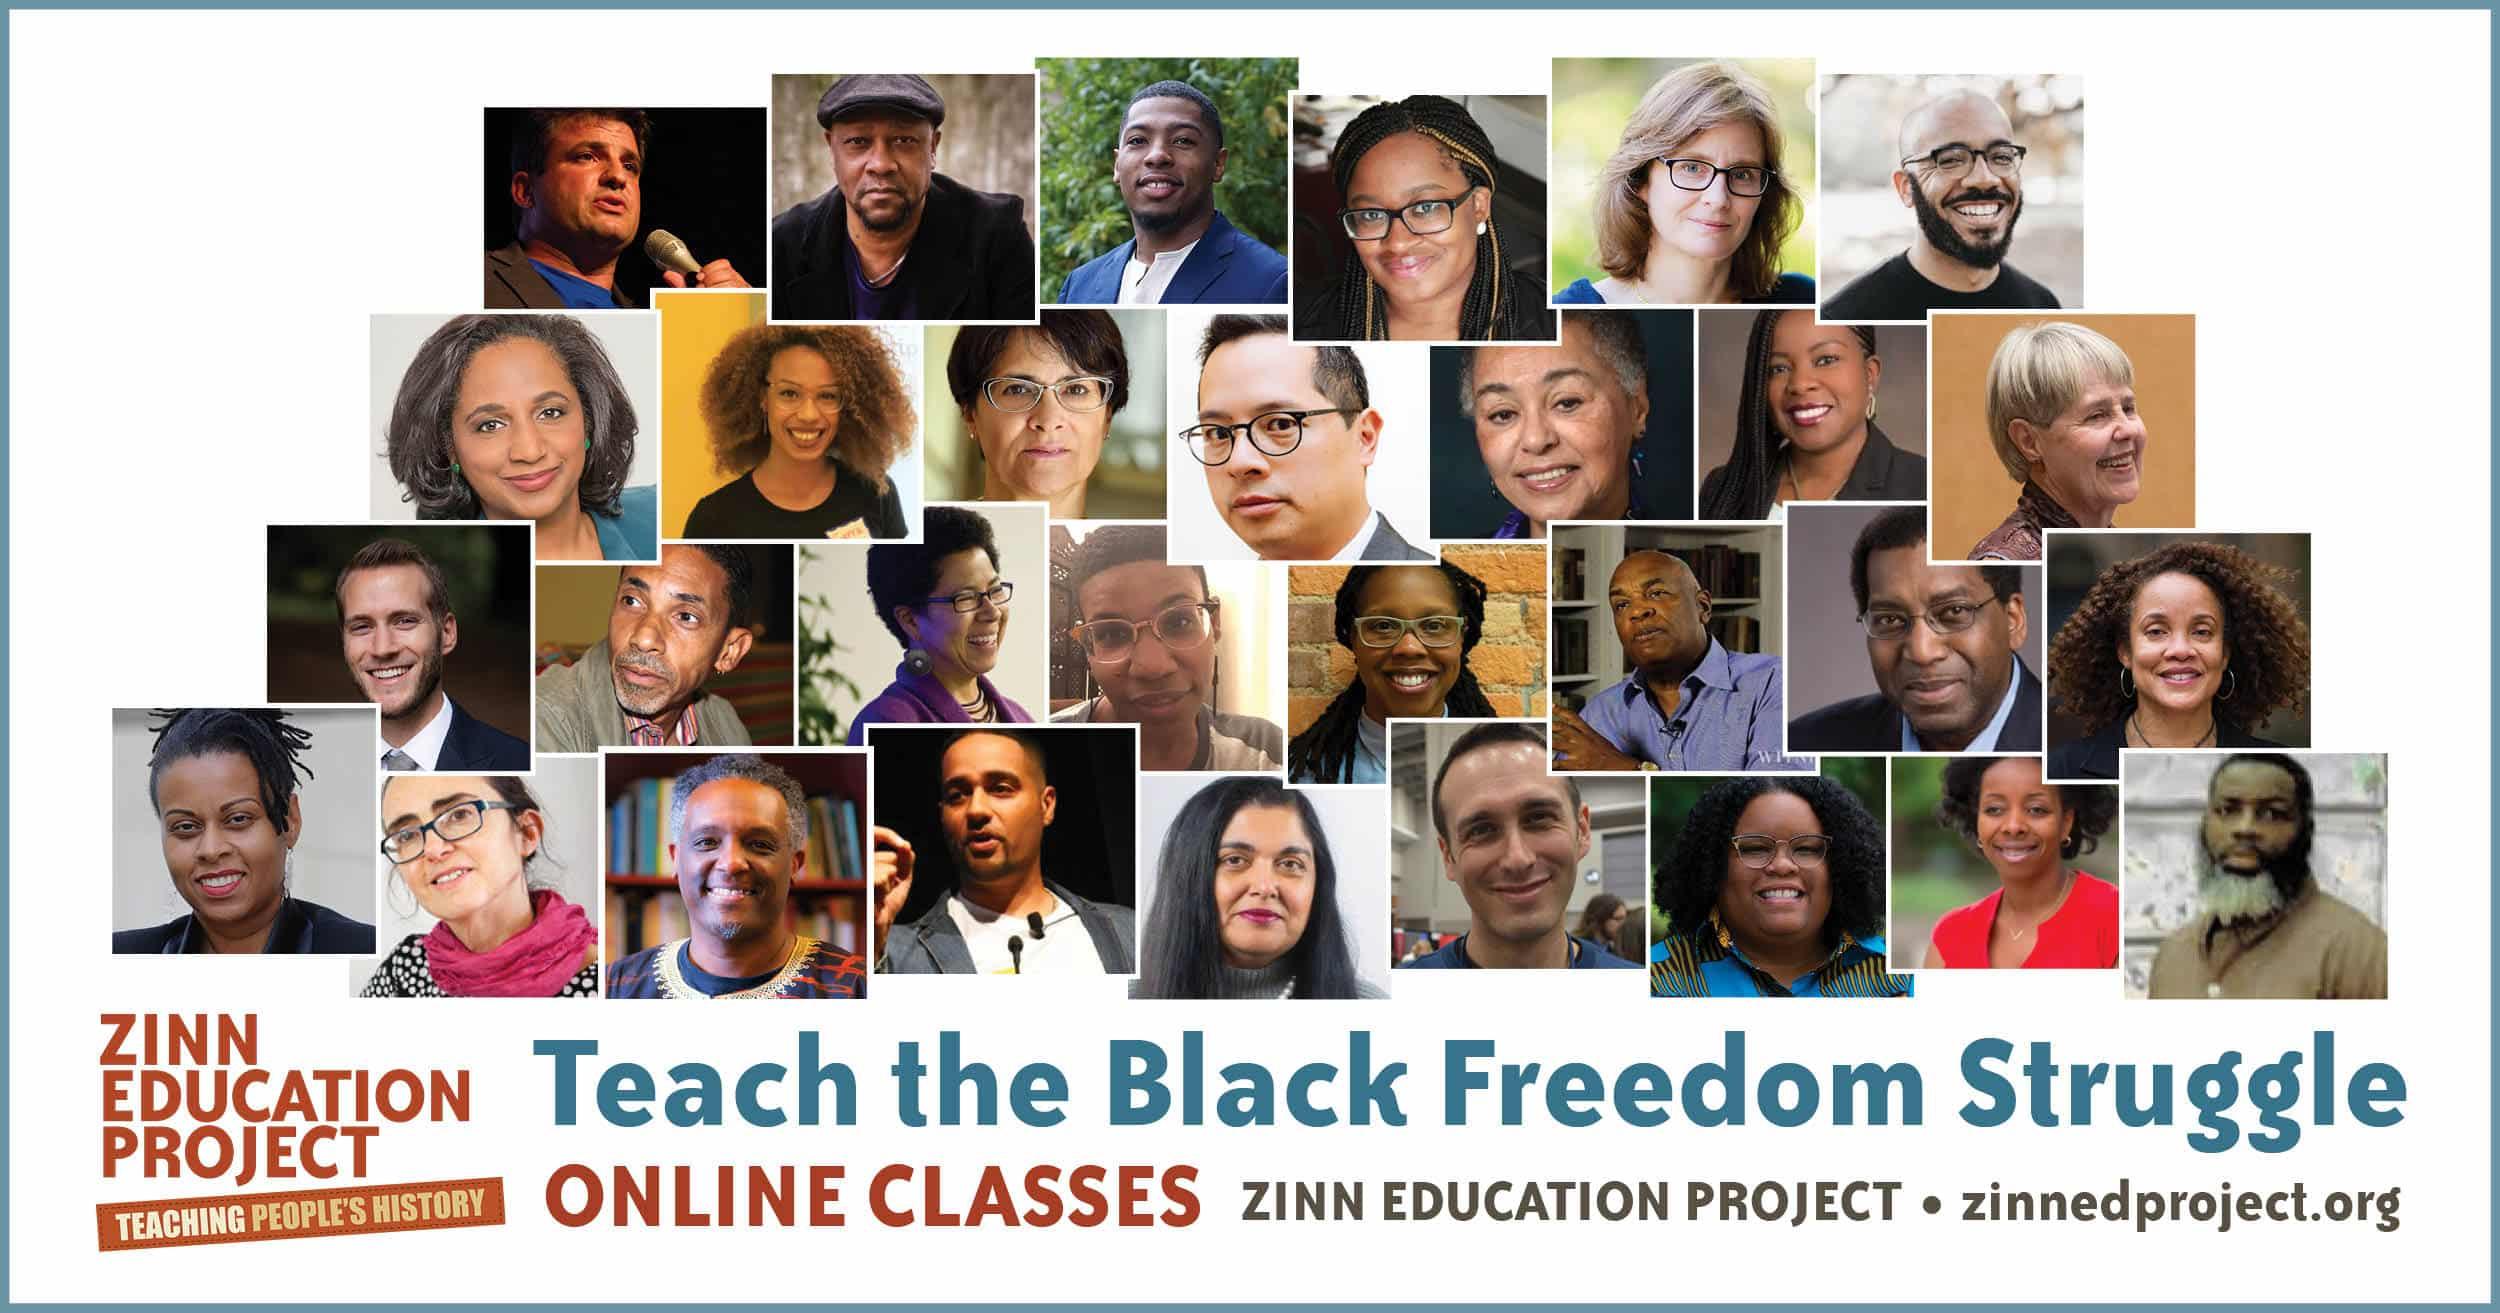 Teach the Black Freedom Struggle Online Classes